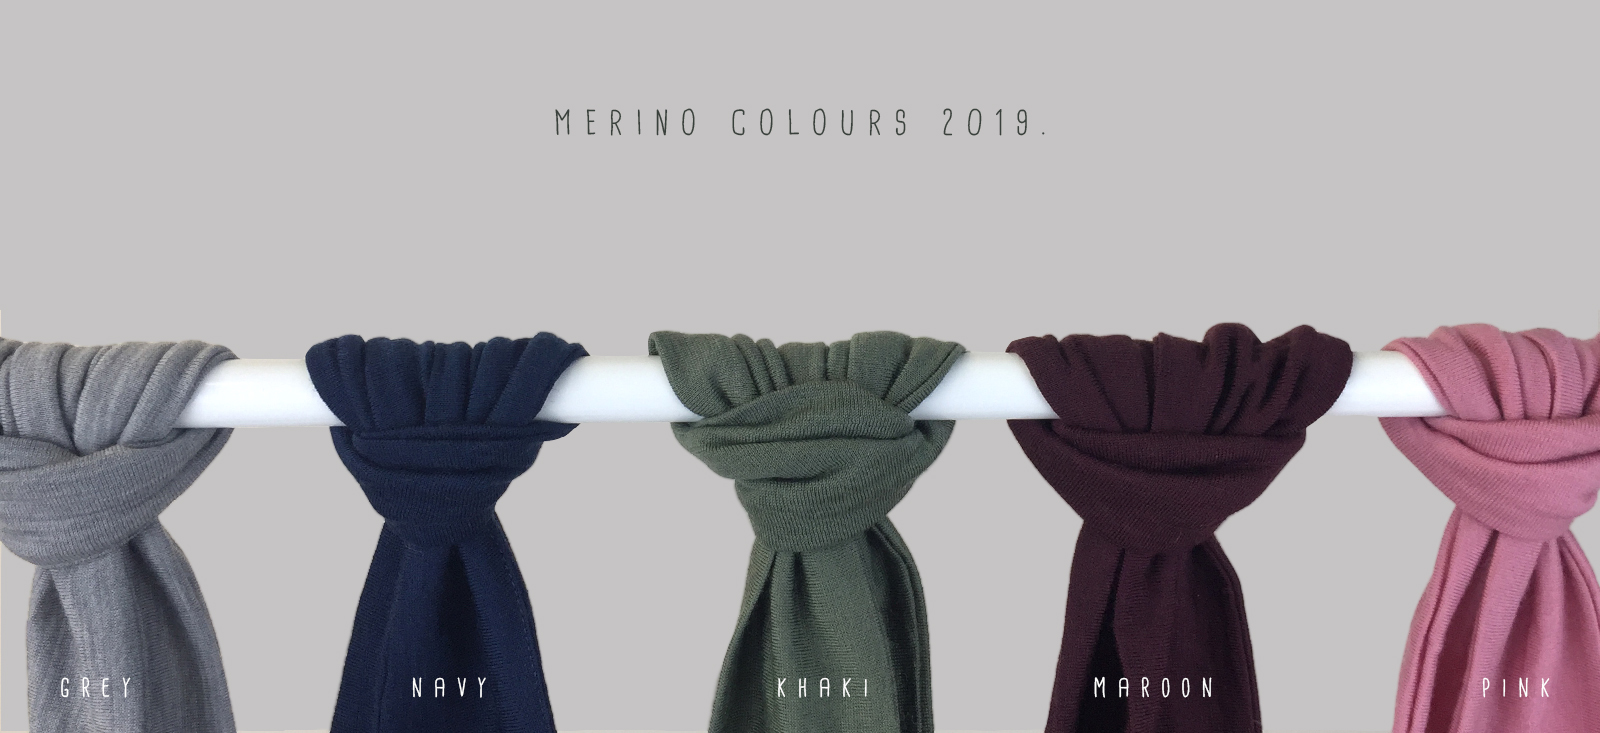 aee2b57f7 Babu Baby Clothes - Organic & Merino